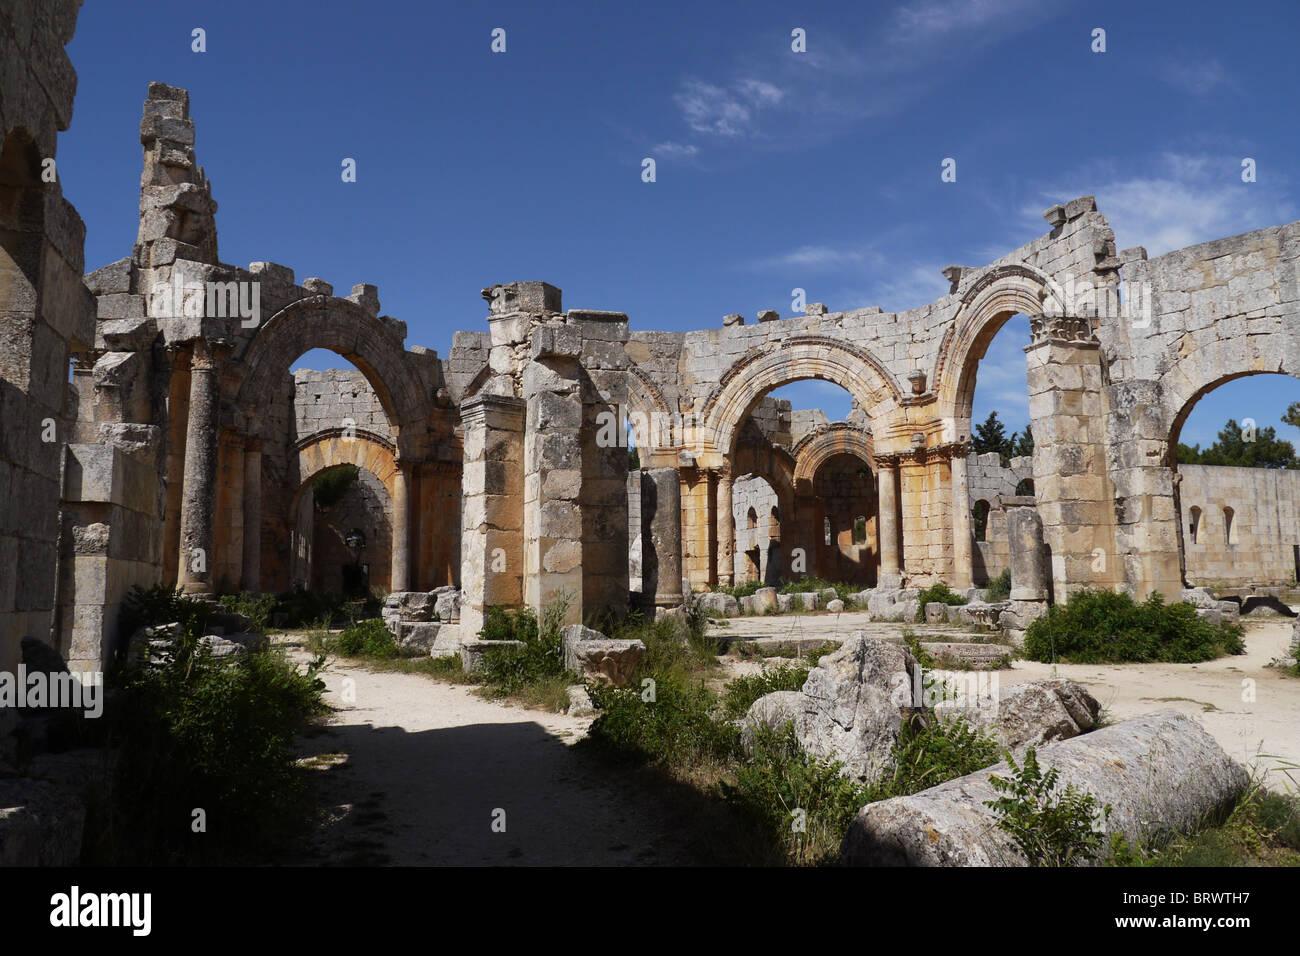 SYRIA Qala'at Samaan (Saint Simeon) ruined basilica near Aleppo. PHOTOGRAPH by Sean Sprague - Stock Image